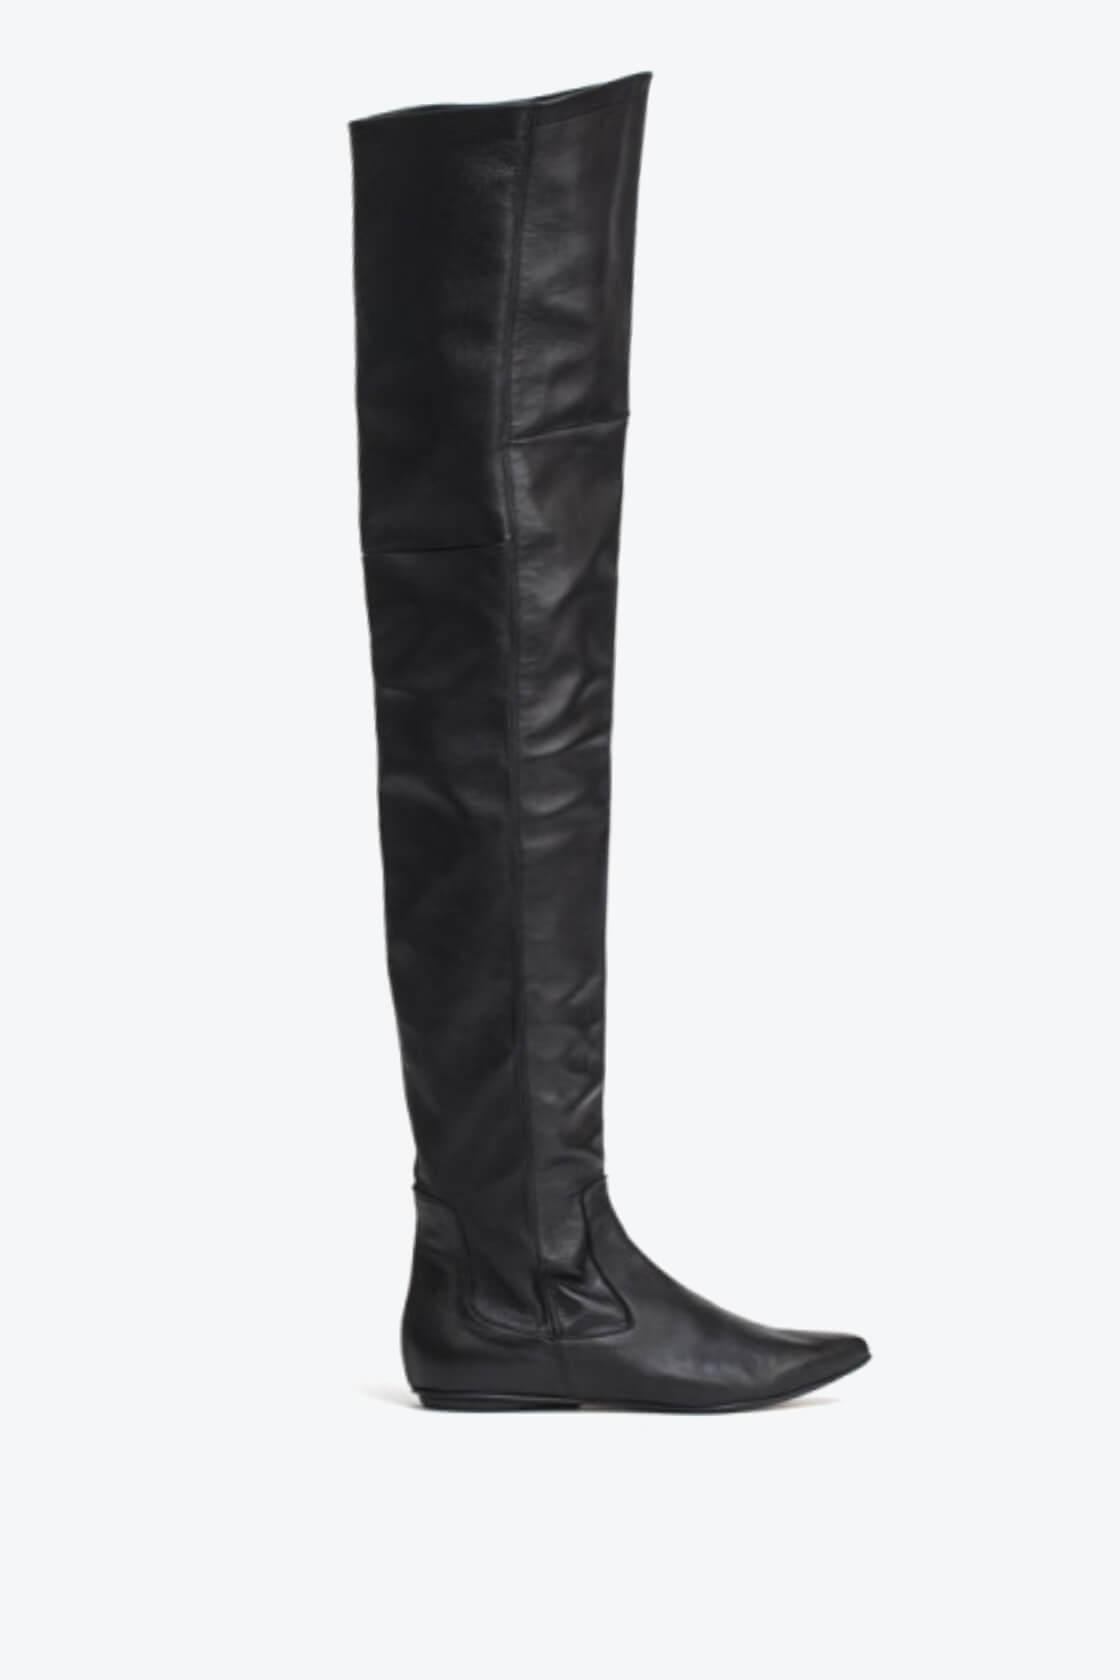 EJK0000070 Daryl thigh high boots 1